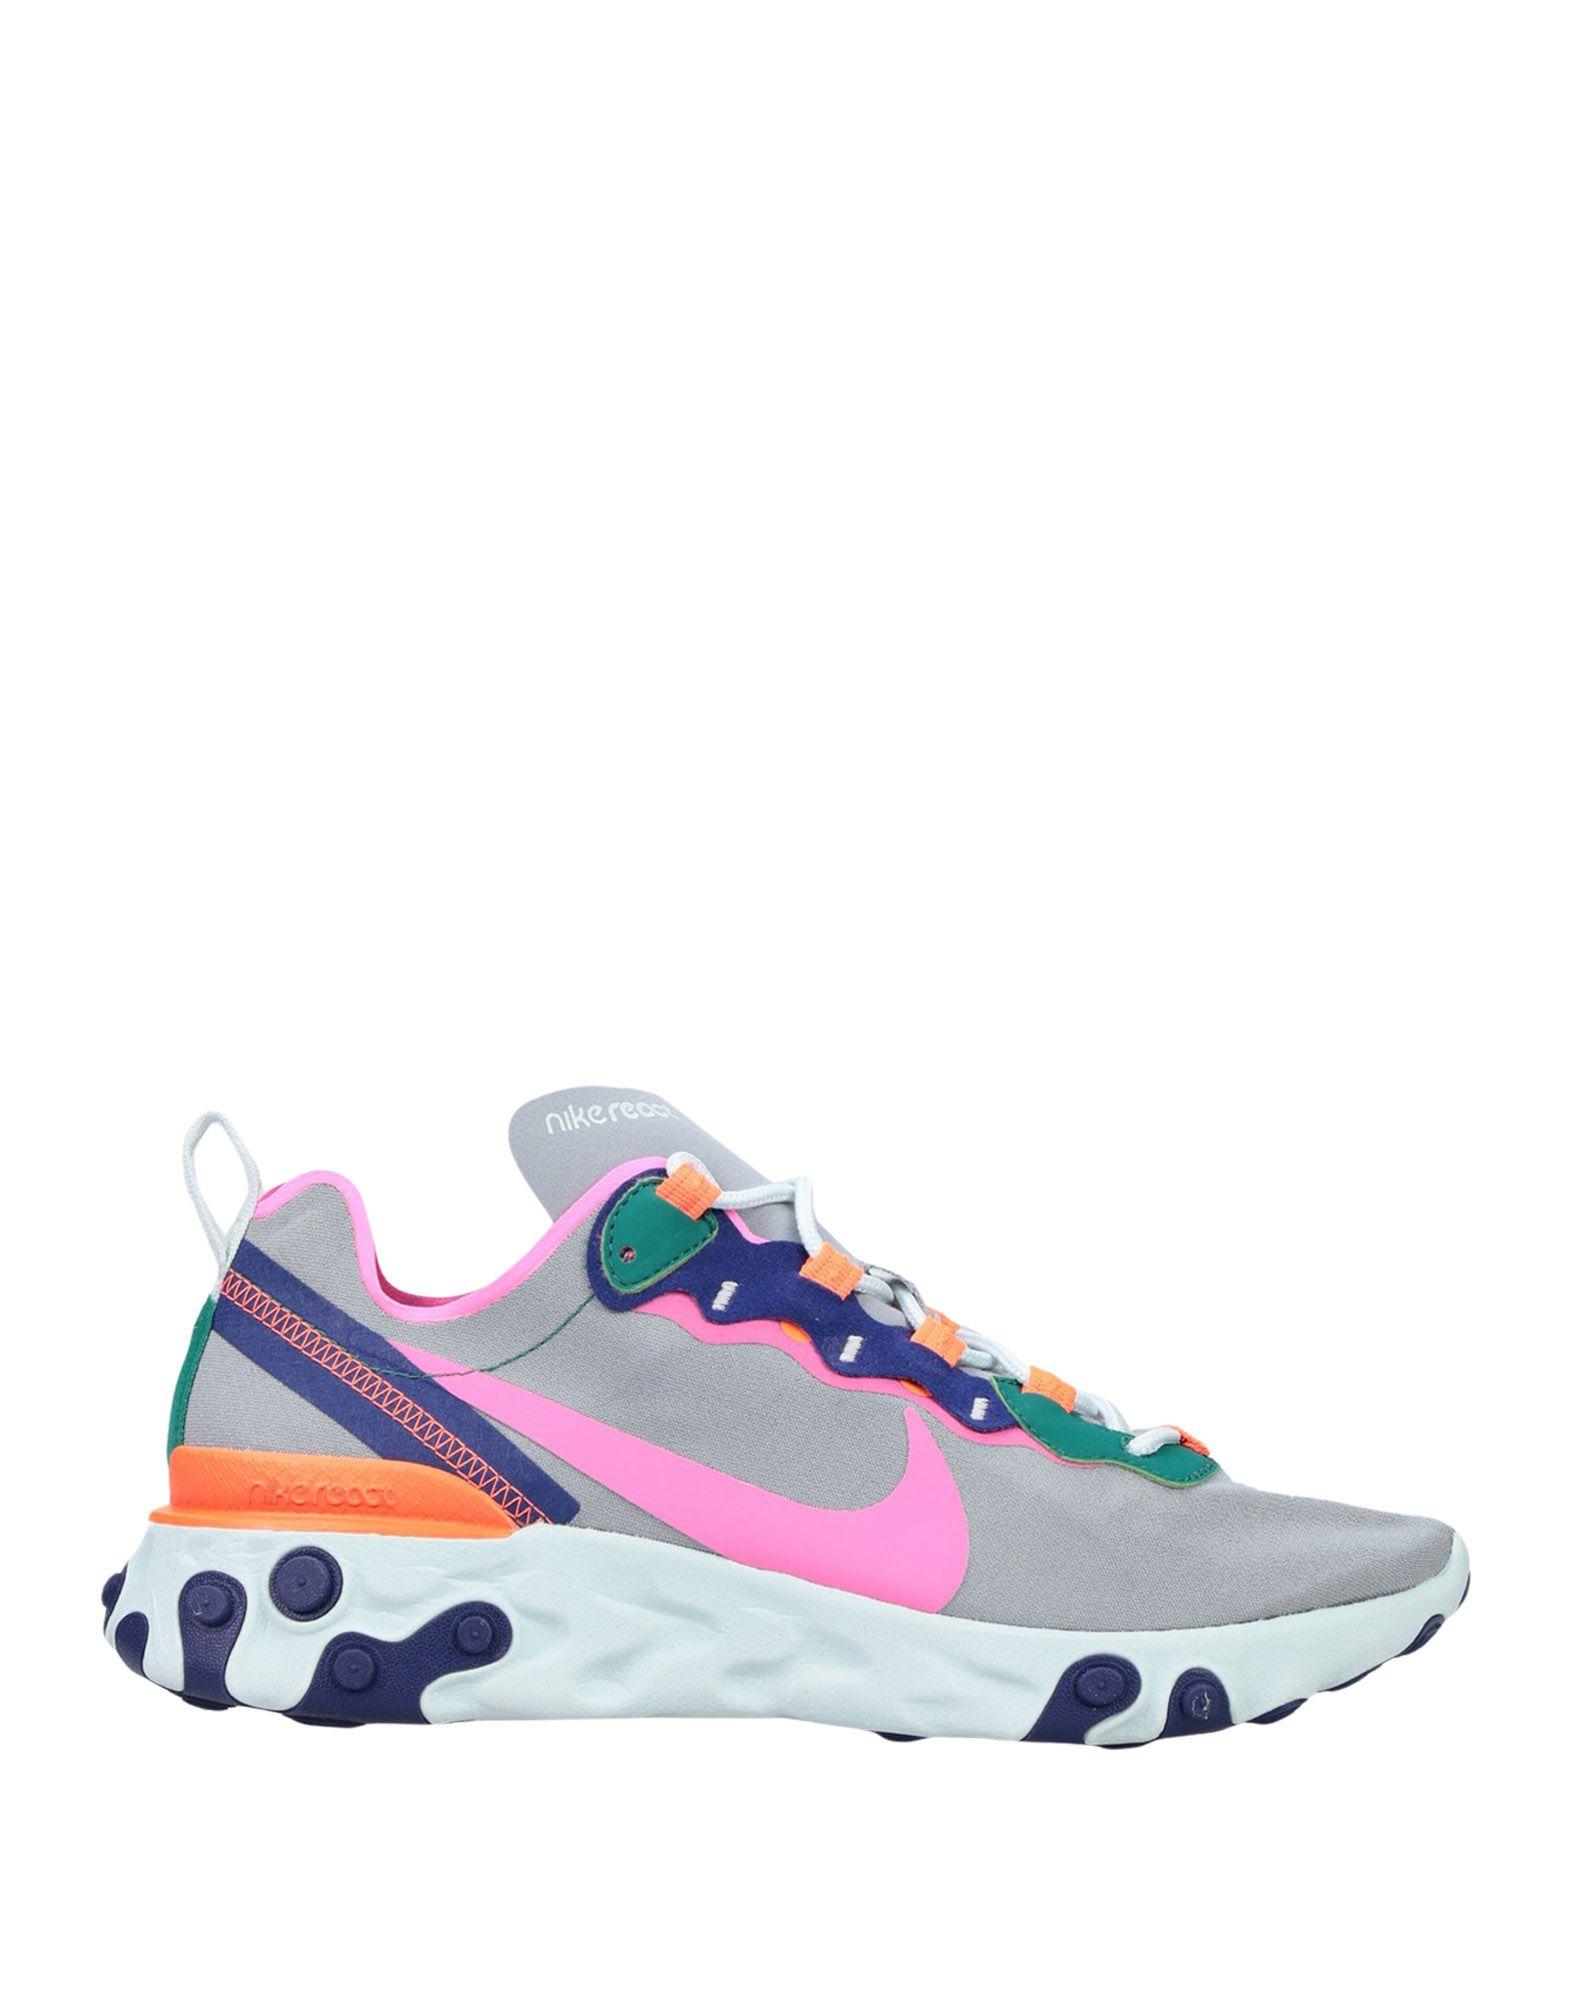 Nike React кроссовки купить